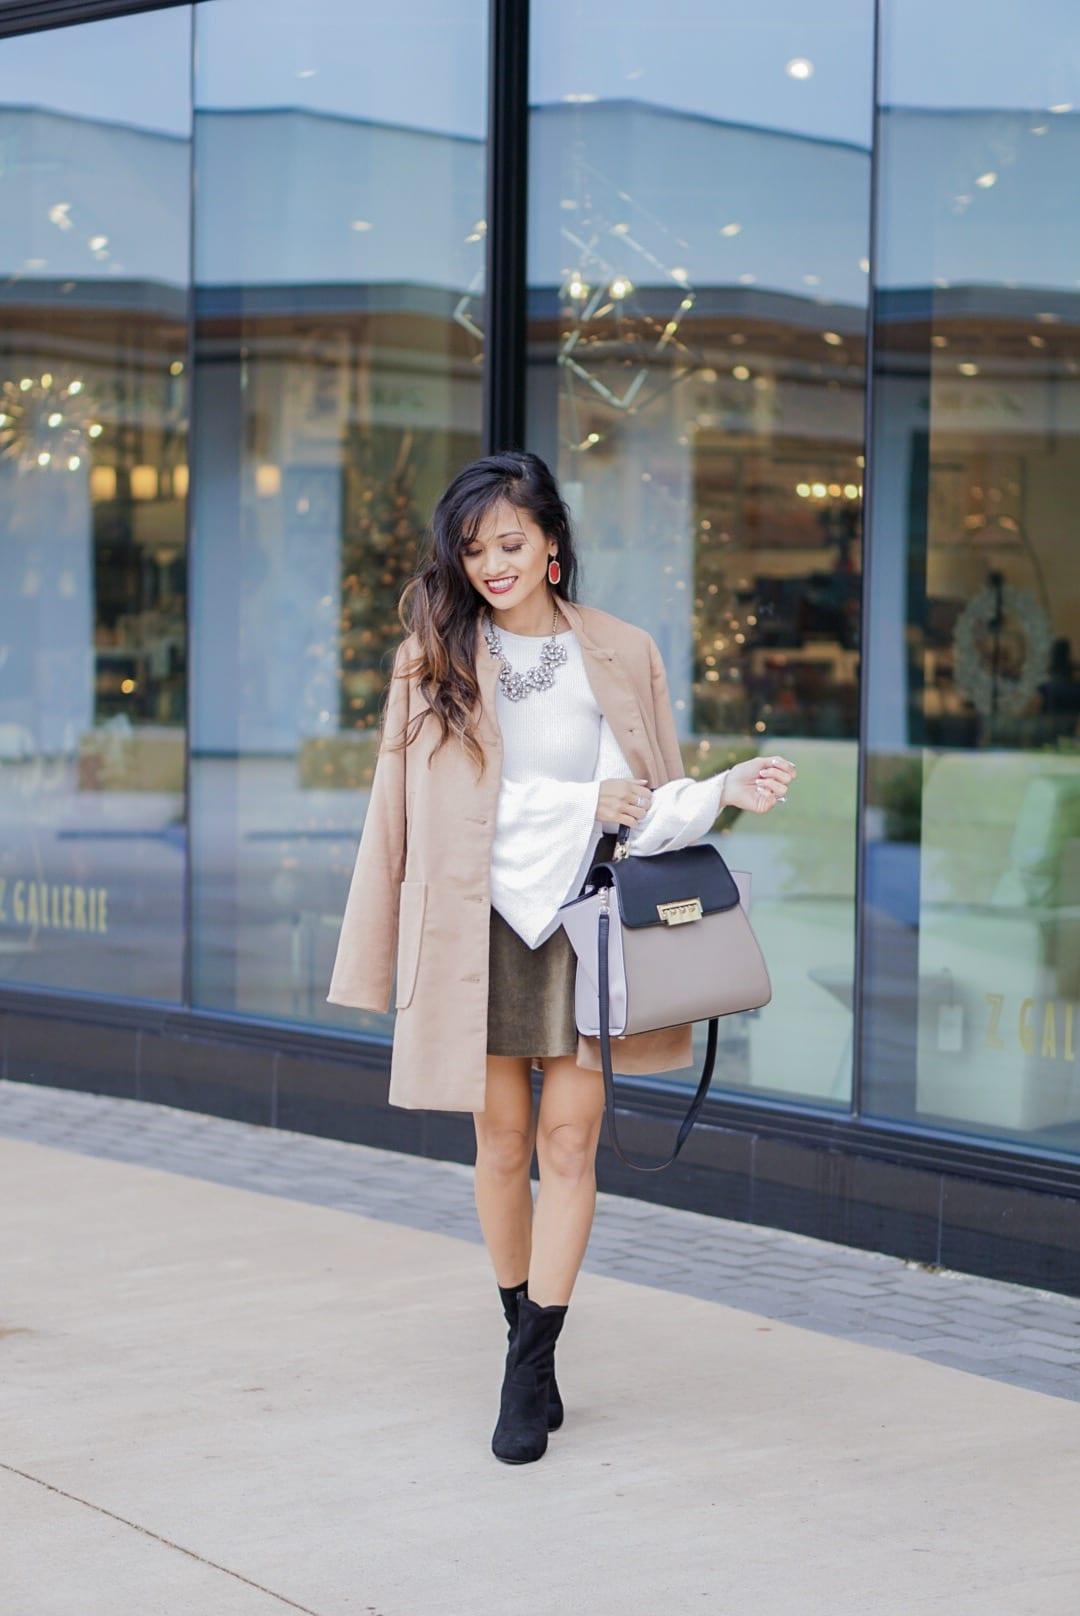 camel coat, corduroy skirt, black sock booties, winter outfit, white bell sleeve top, Zac Posen bag, red Kendra Scott earrings